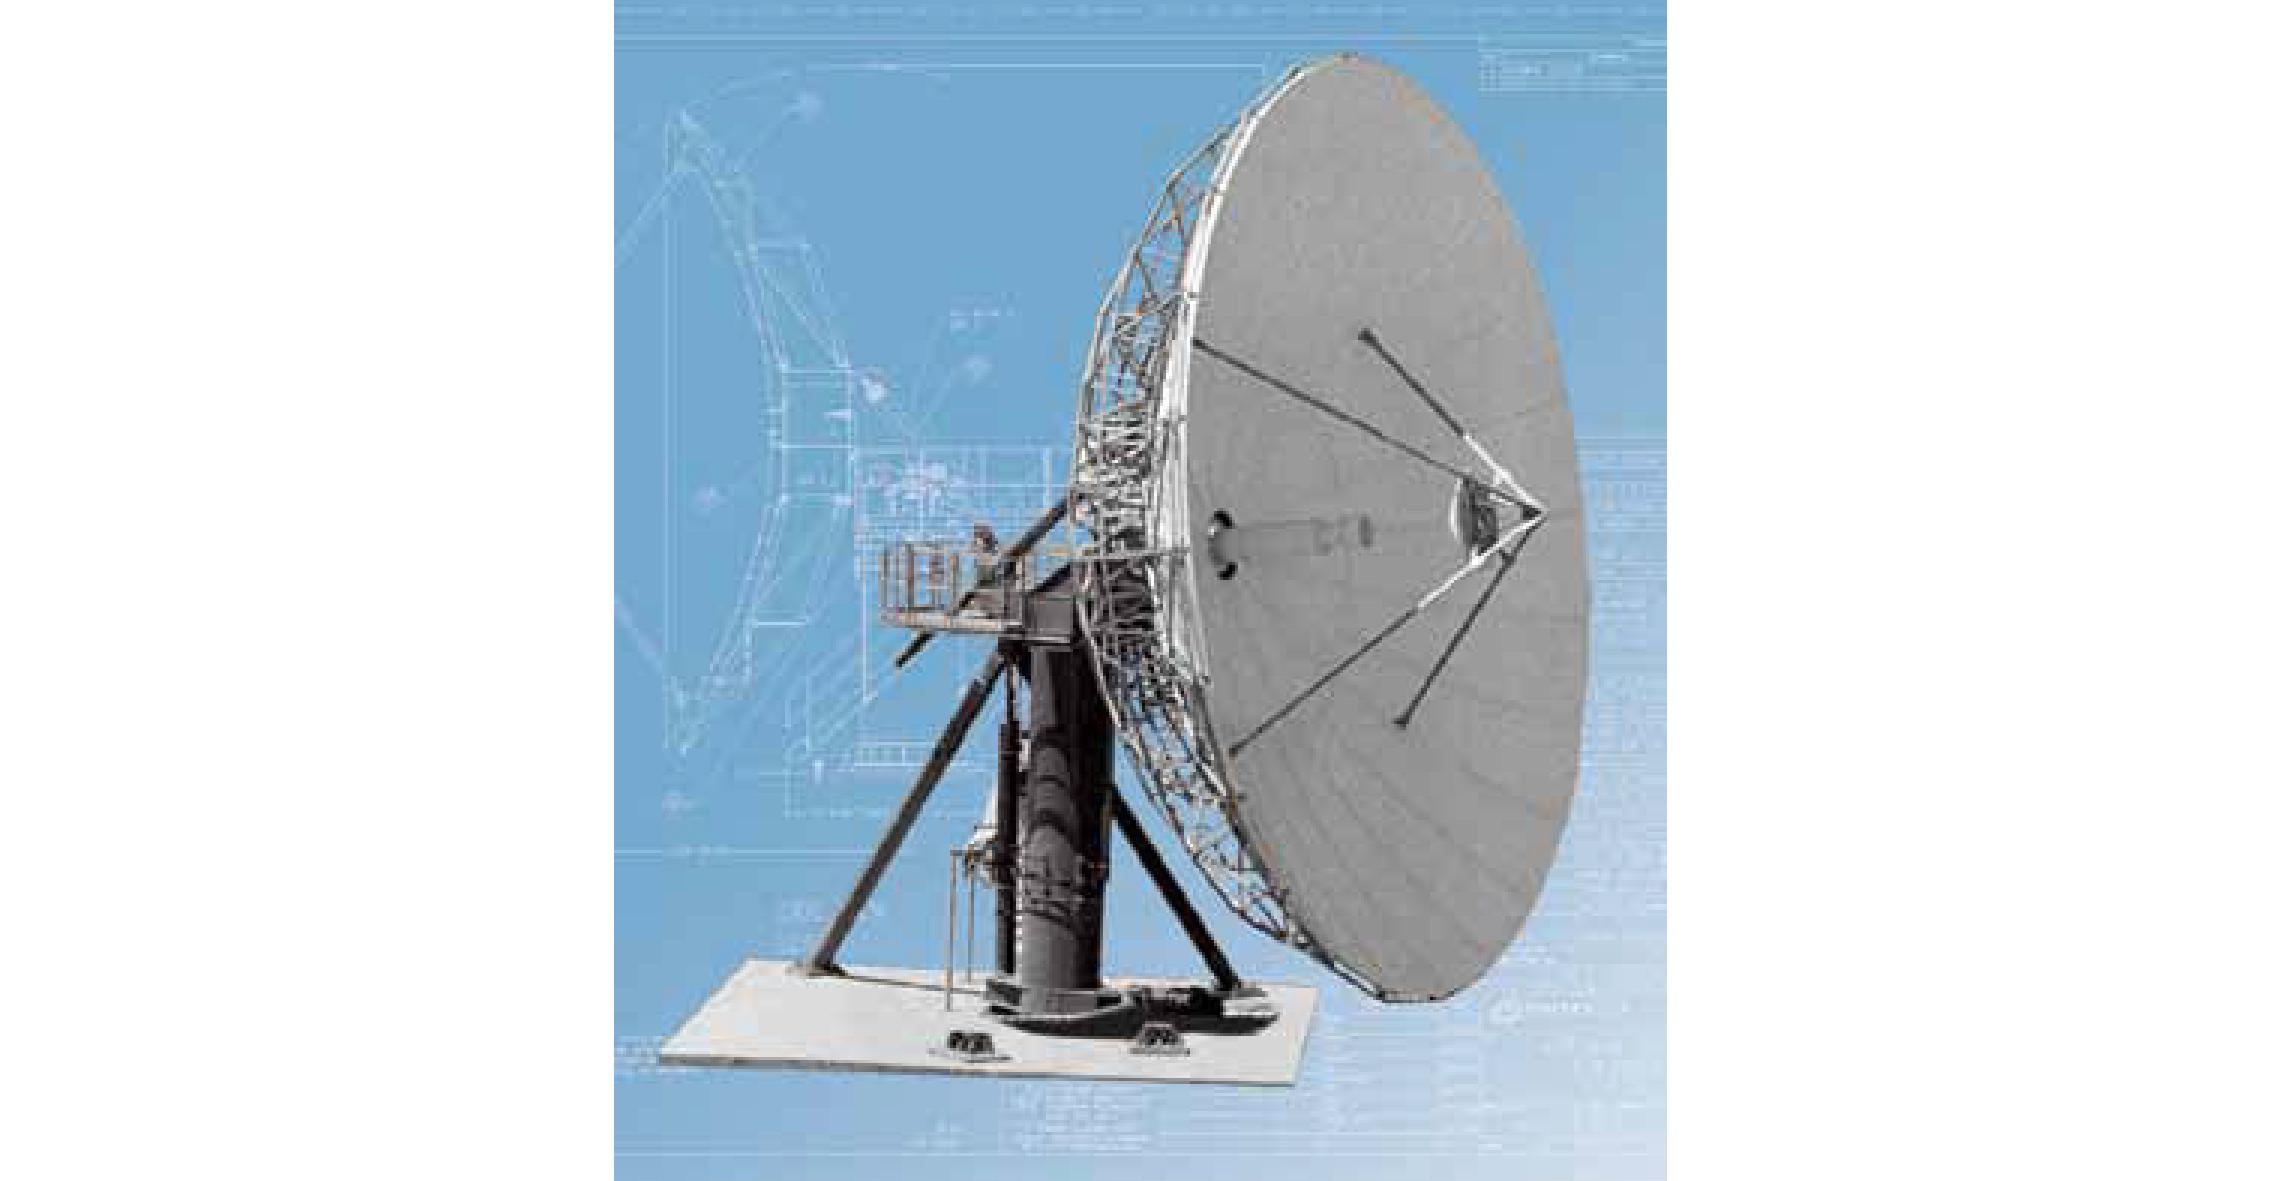 13.1m. Antenna